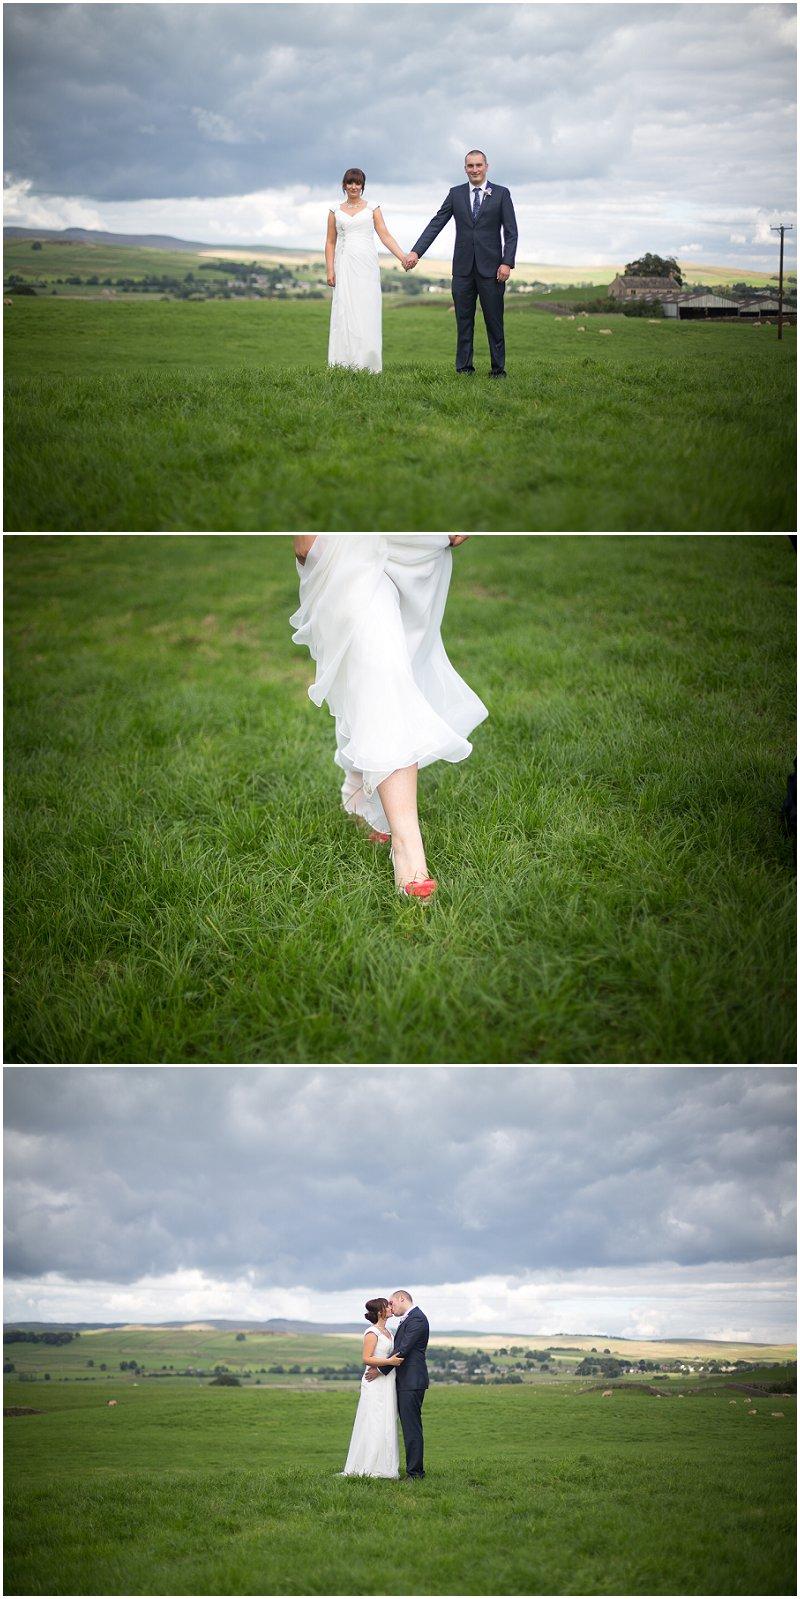 Wedding Photographer Yorkshire | Couples Portraits